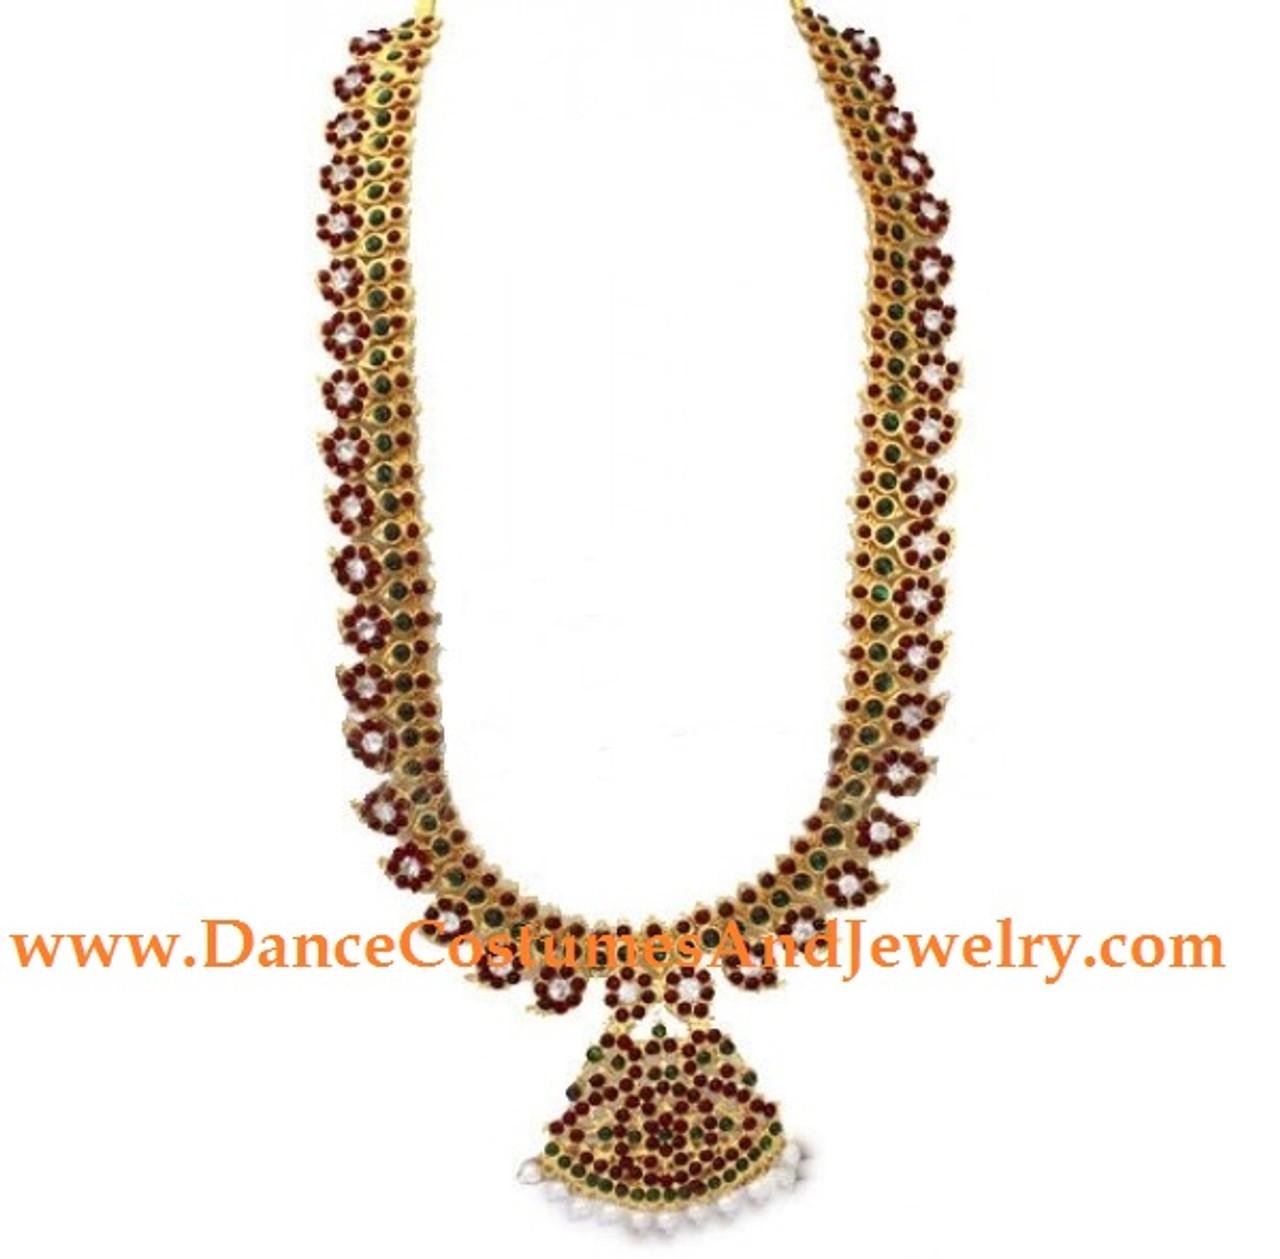 e2b2a8ed528 Long Manga Mala Imitation Temple Jewelry for bharatanatyam dance